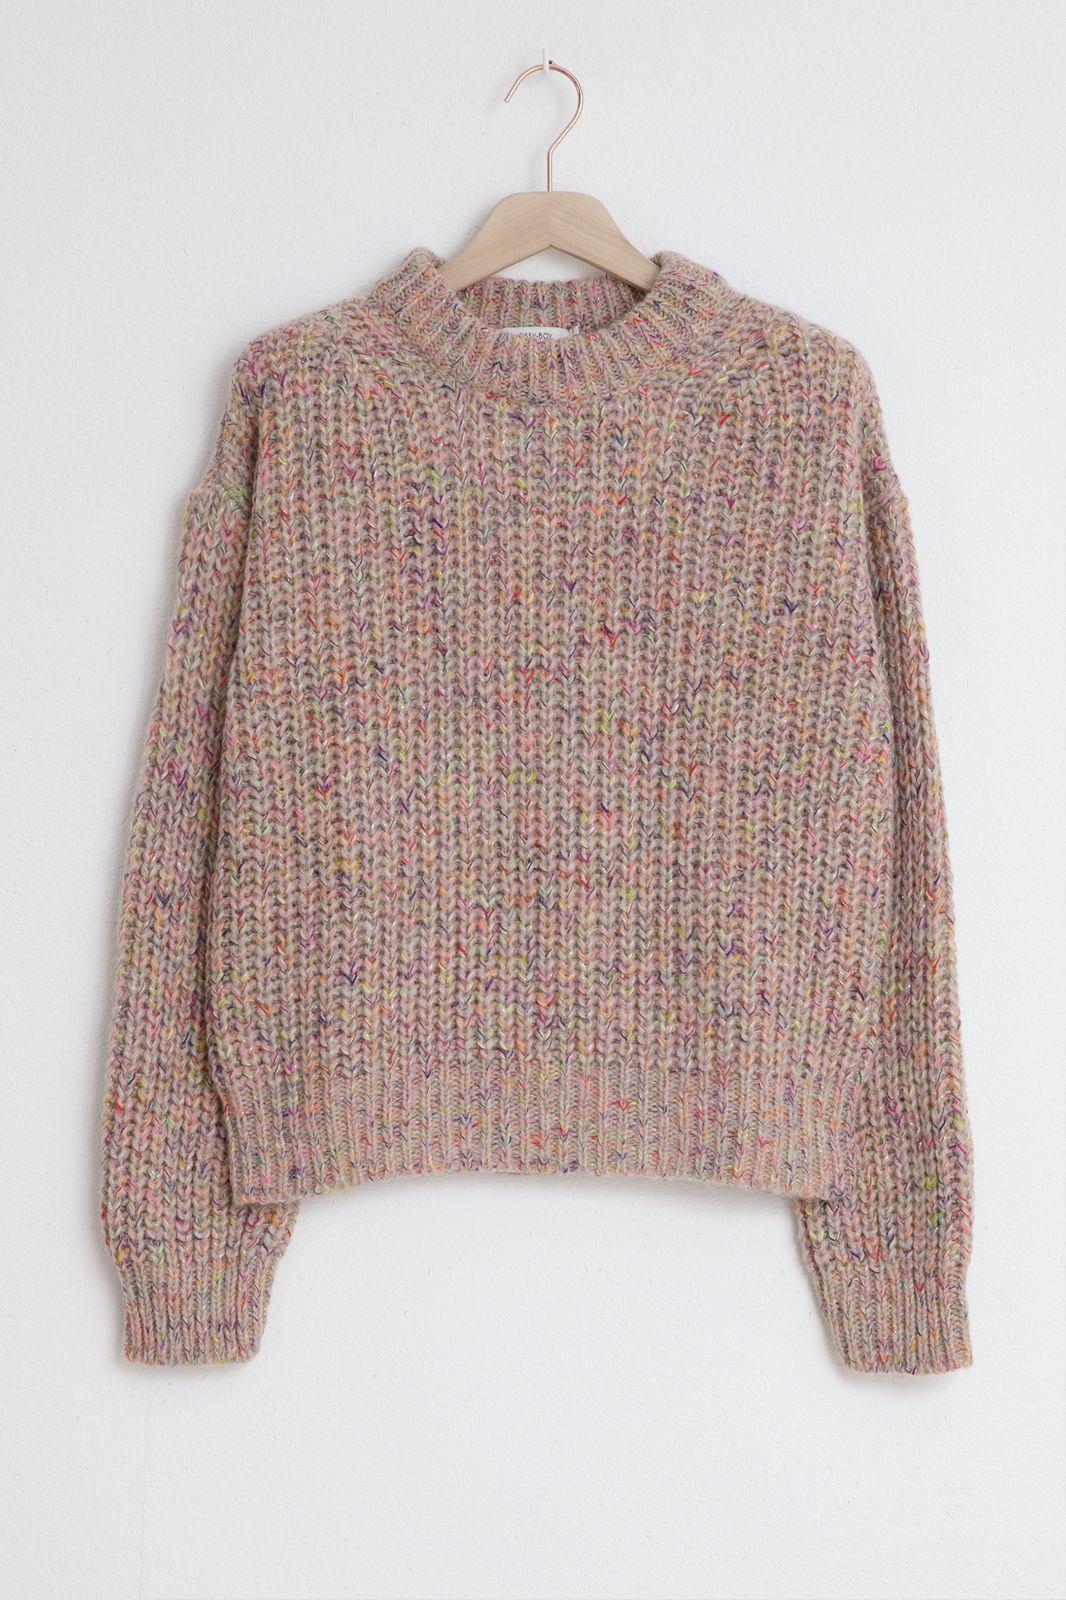 Roze gebreide trui